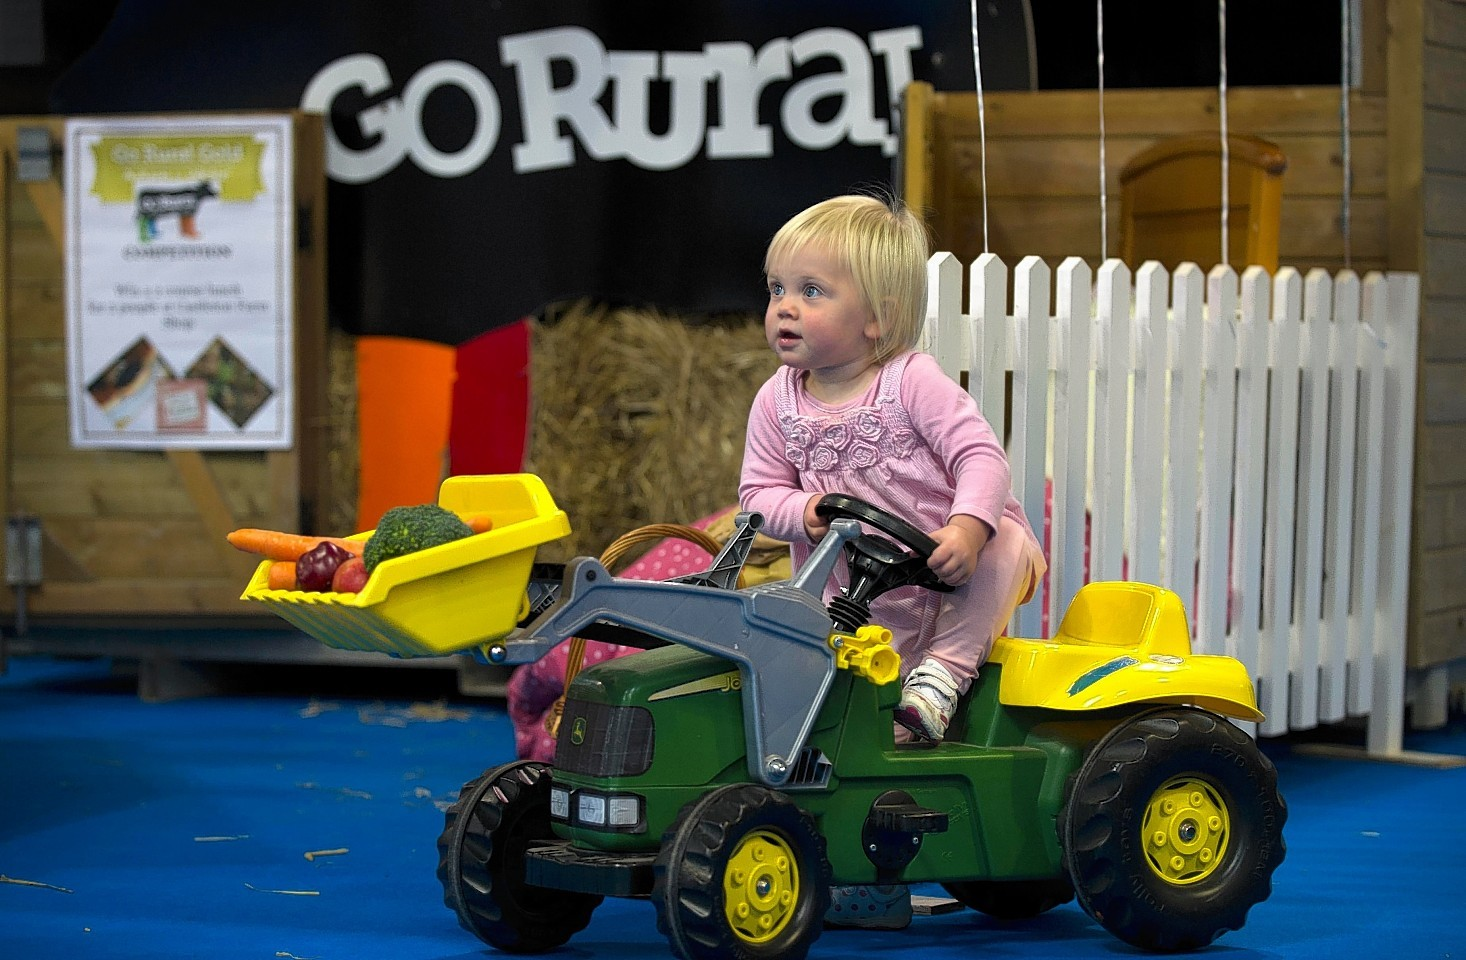 Go Rural will no longer be a membership organisation